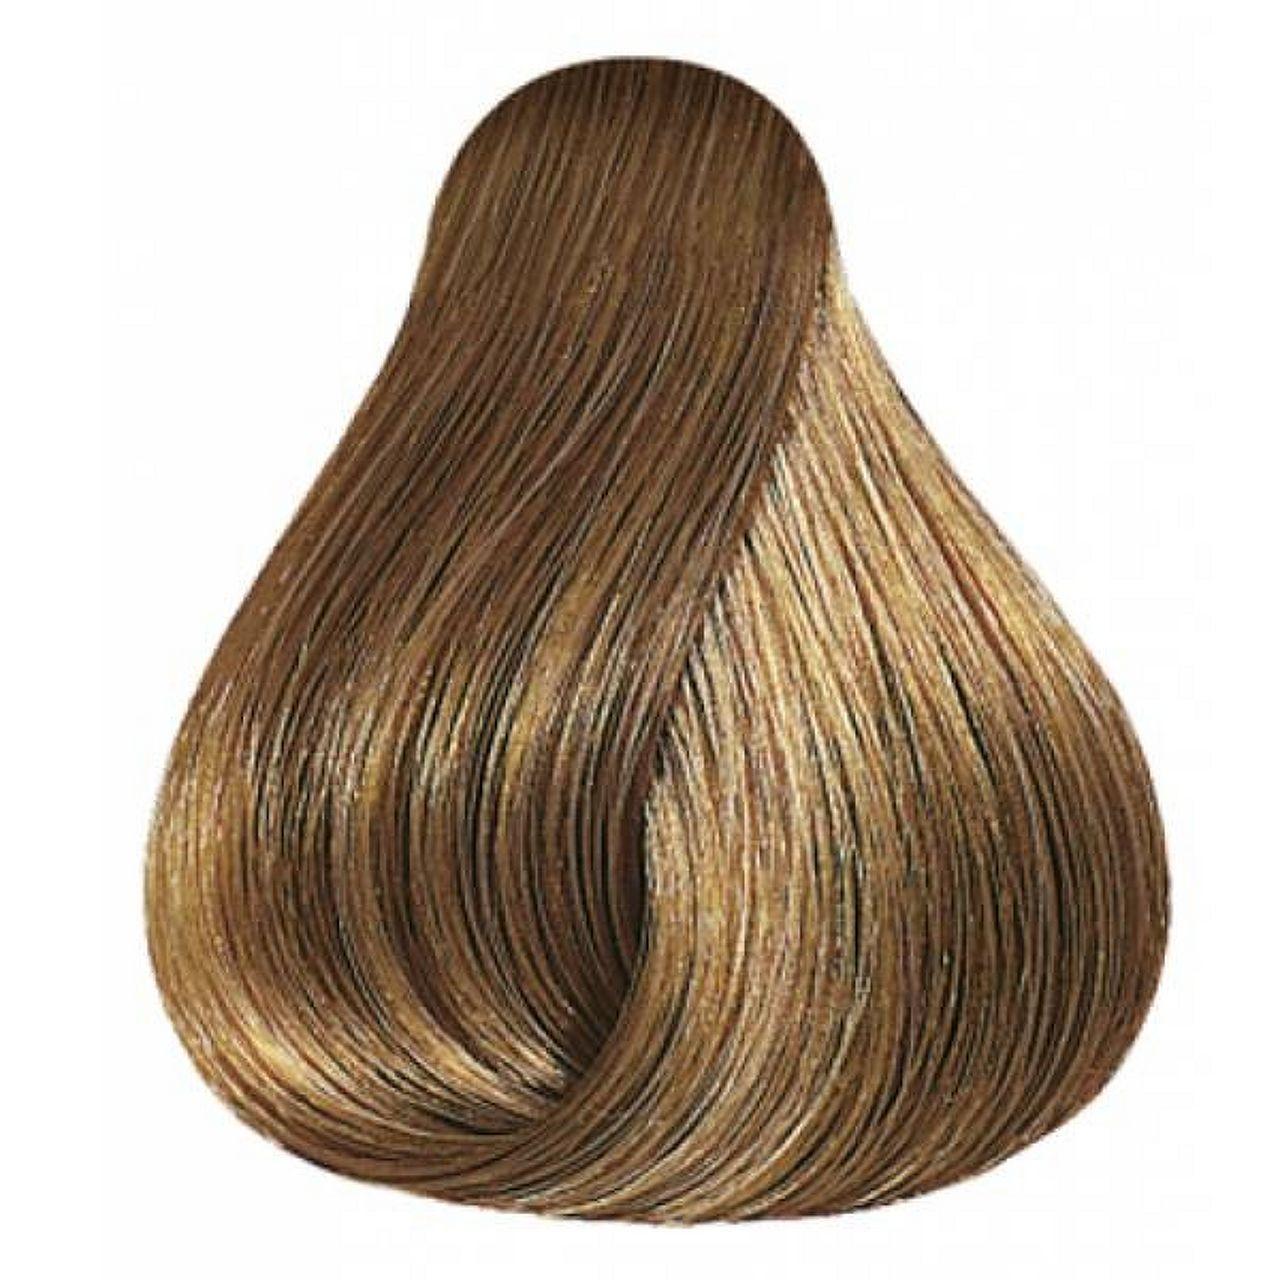 Wella koleston perfect 7 blond mediu pur 60ml koleston color wella koleston perfect 7 blond mediu pur 60ml nvjuhfo Image collections